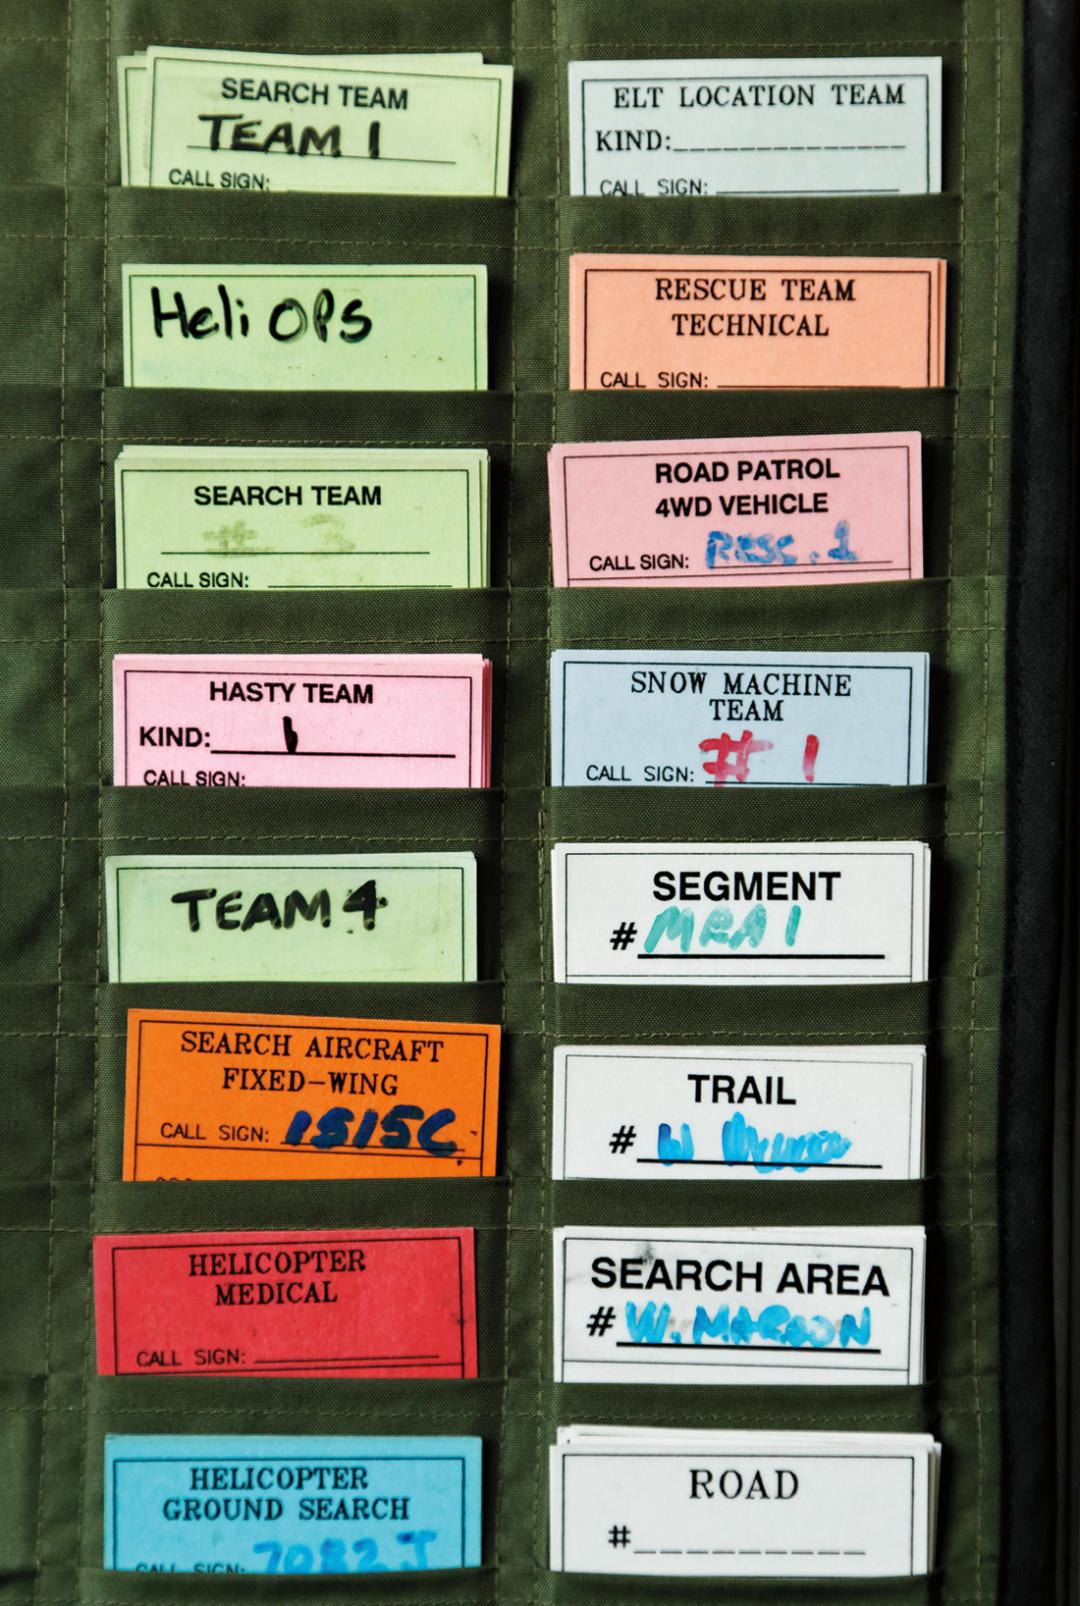 0215 mission call board ckvsrx